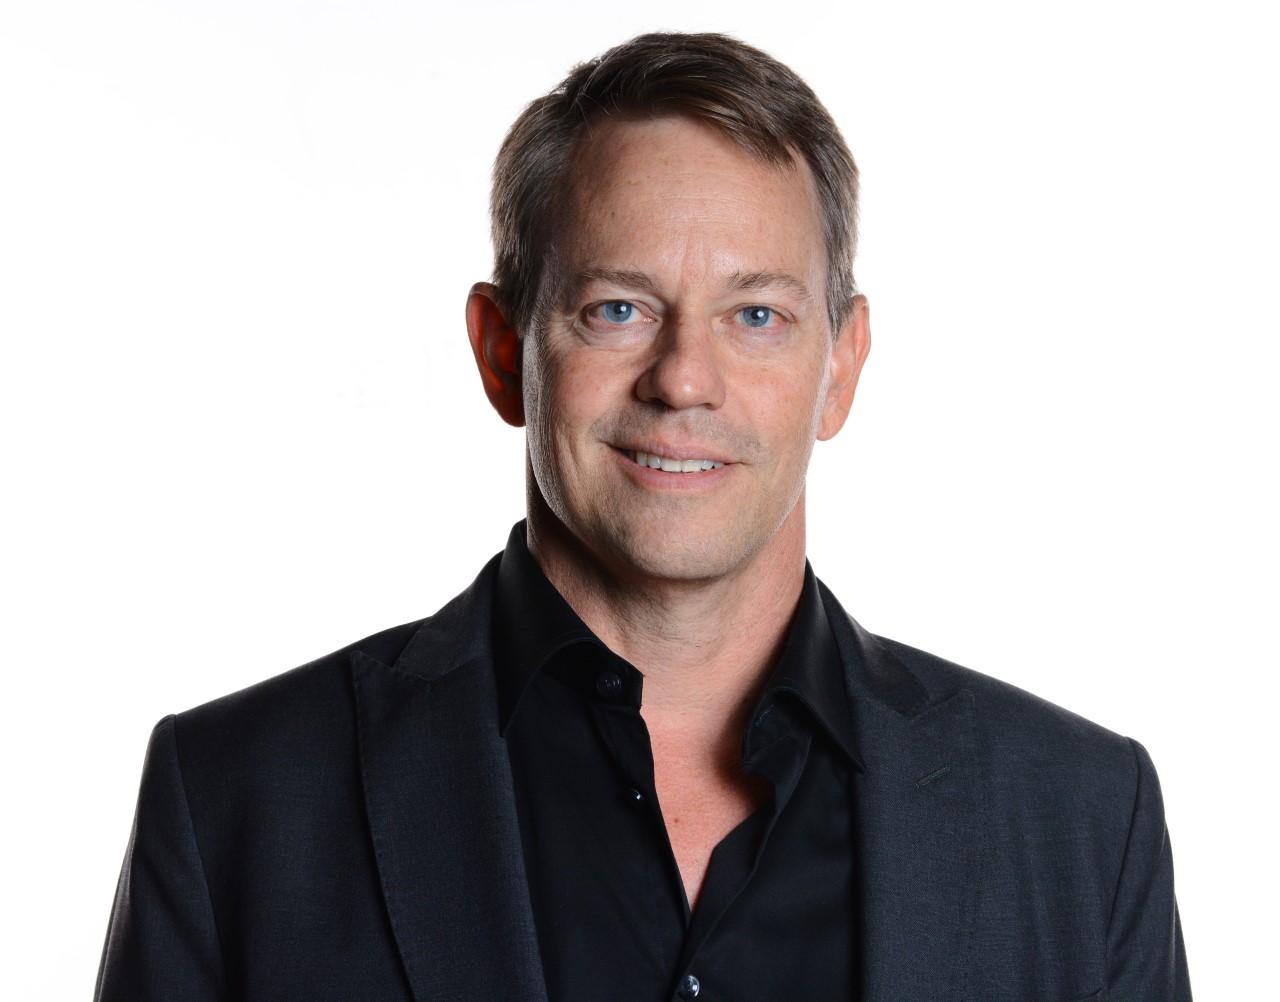 David Webber, Architect